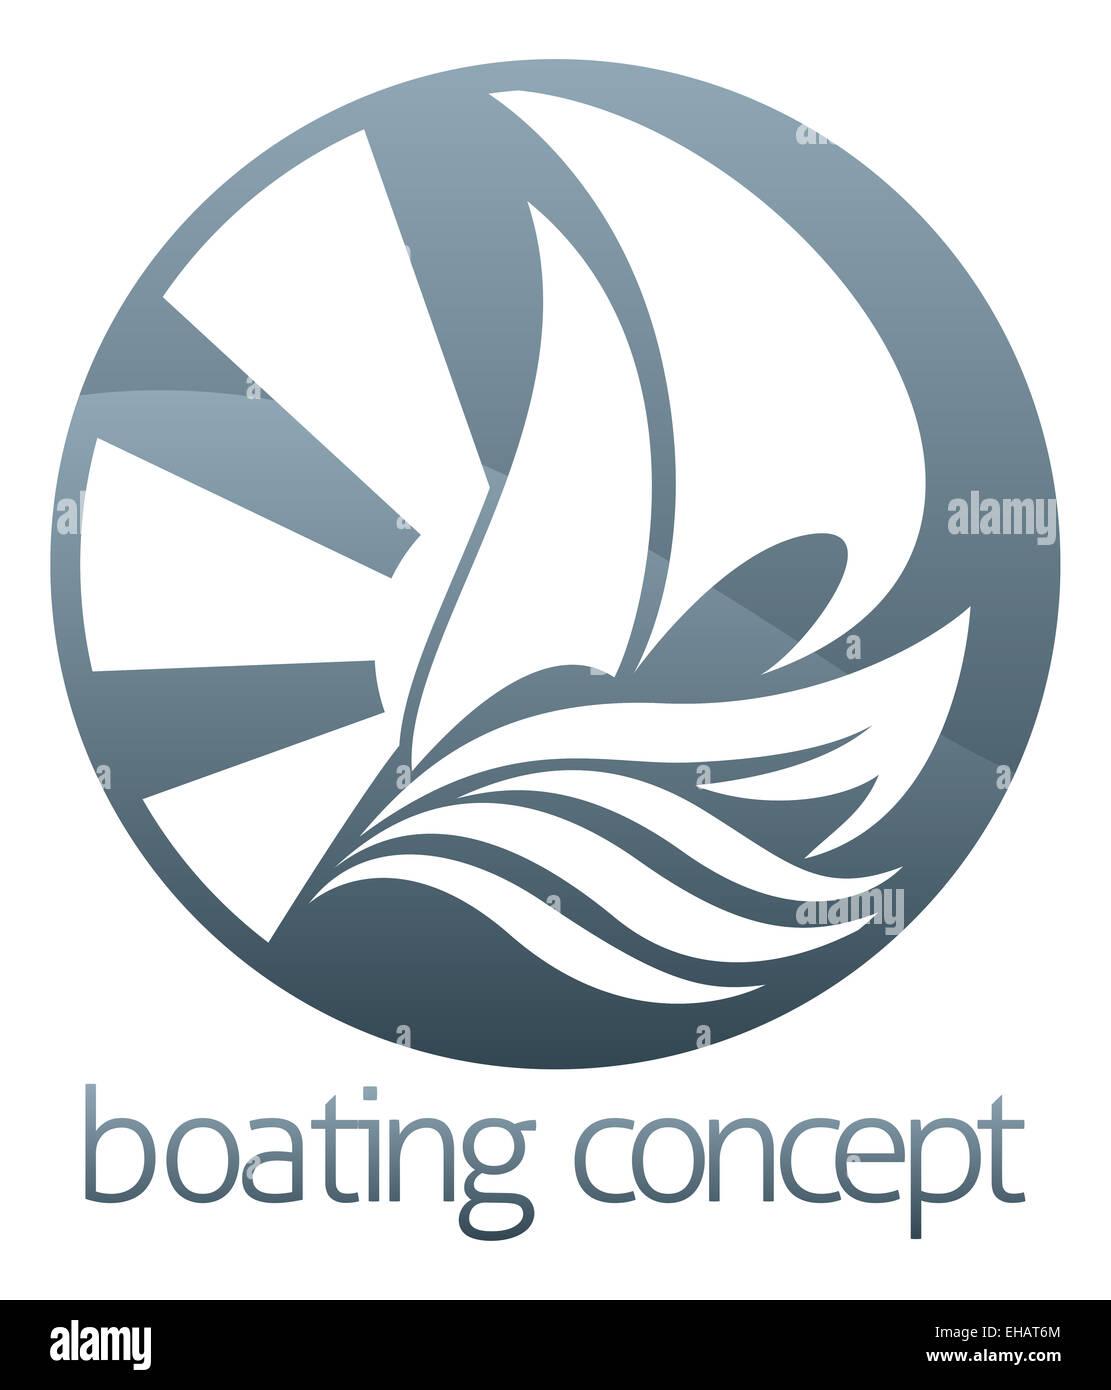 An abstract illustration of a sail boat ship circle concept design - Stock Image